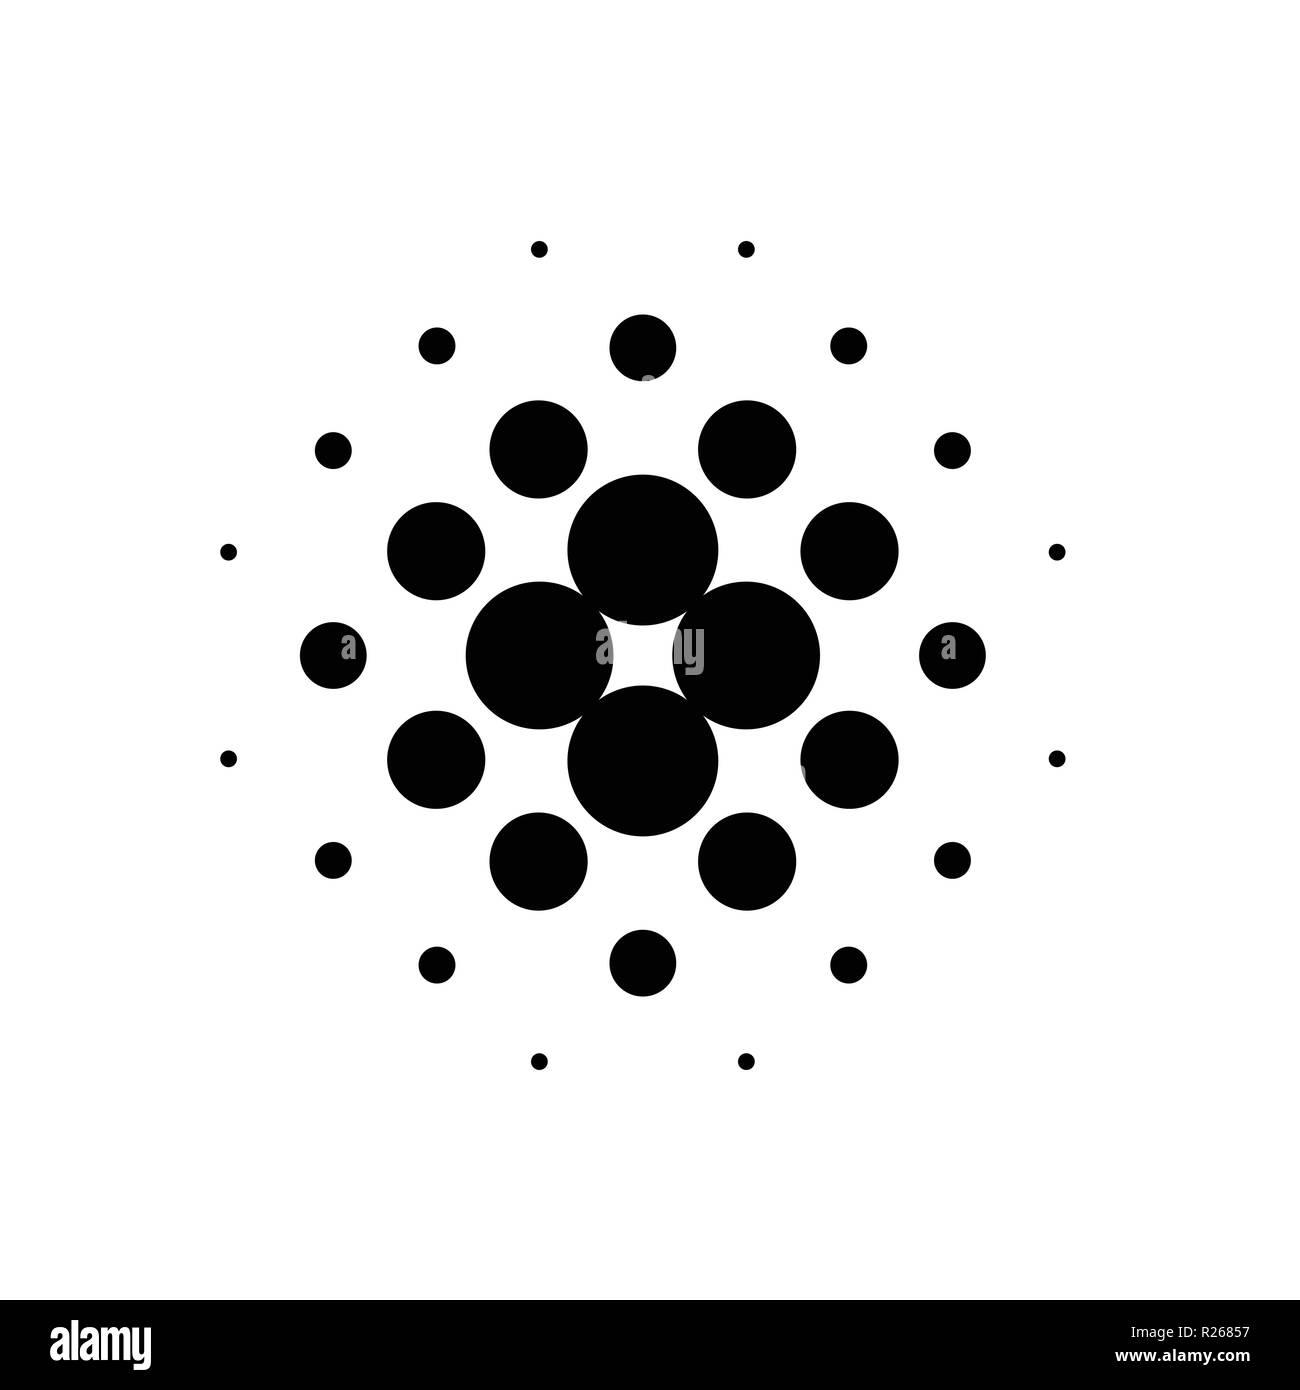 Black Dot Halftone Vector. Isolated on white background. Vector illustration - Stock Image